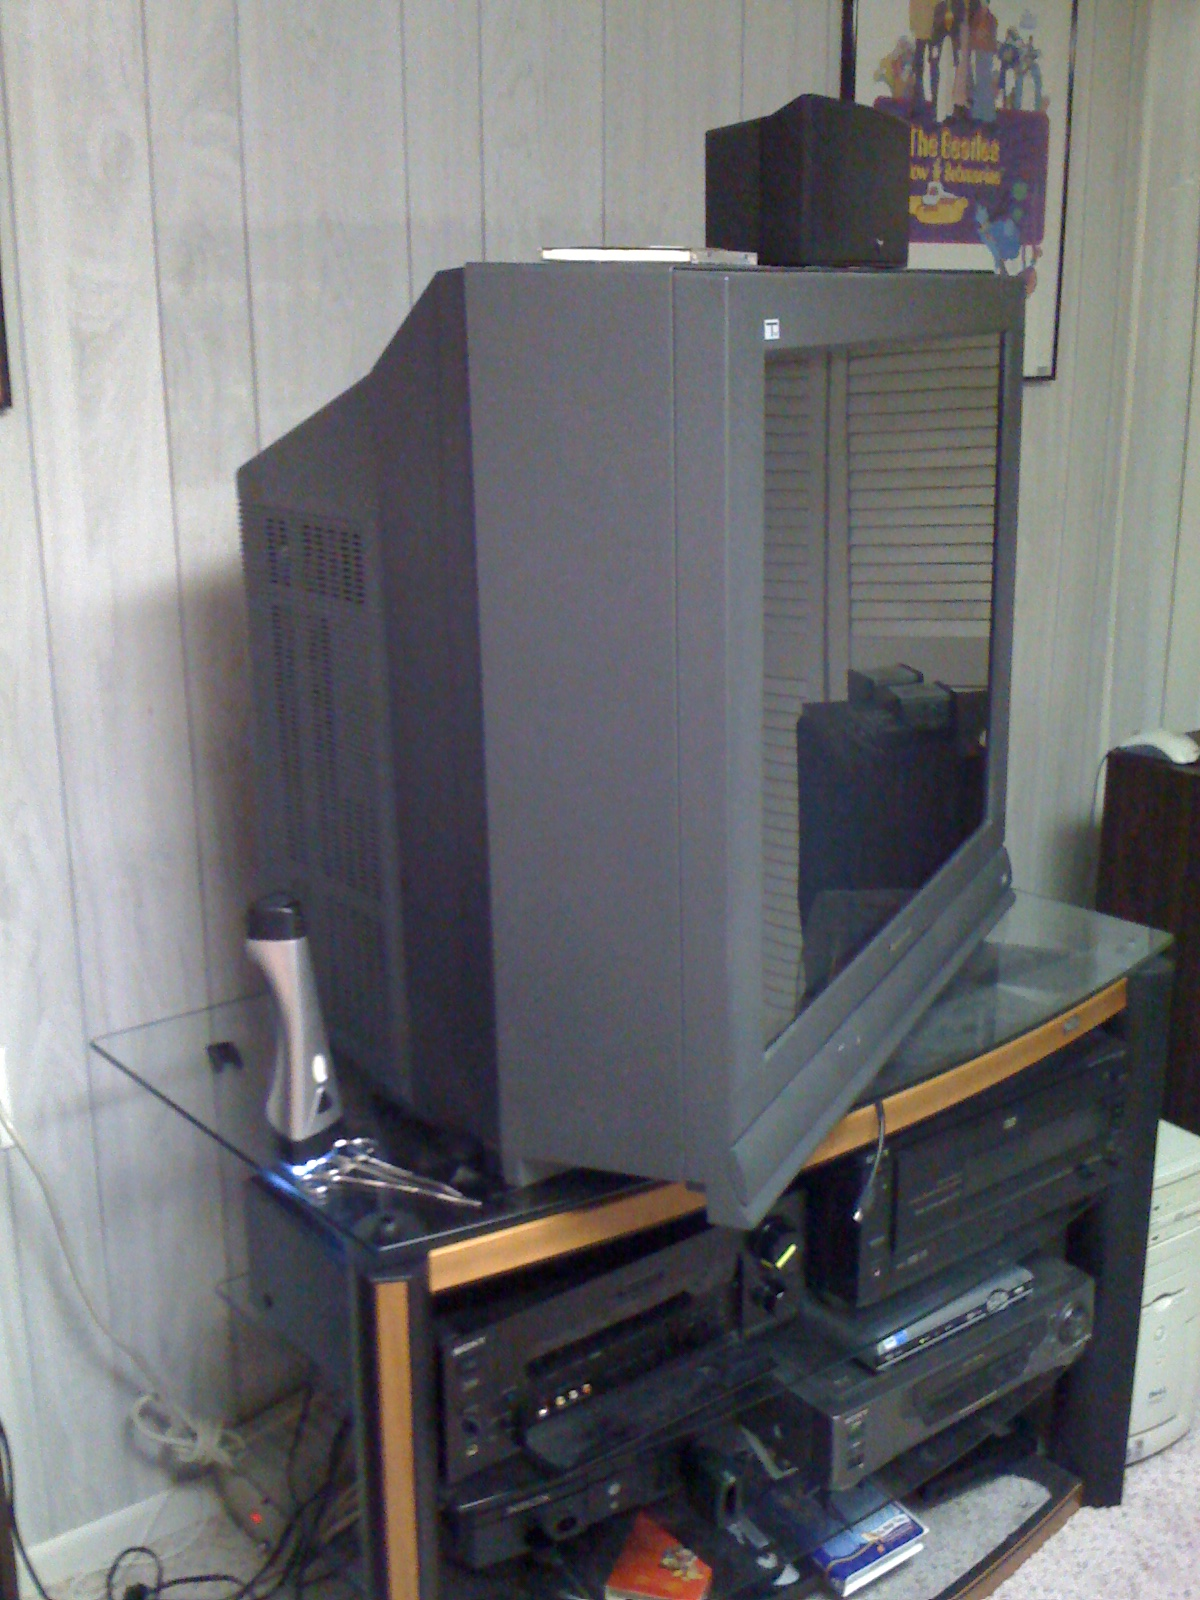 Replacing The Fuse In A Panasonic Tau Tv Ah 120 Box